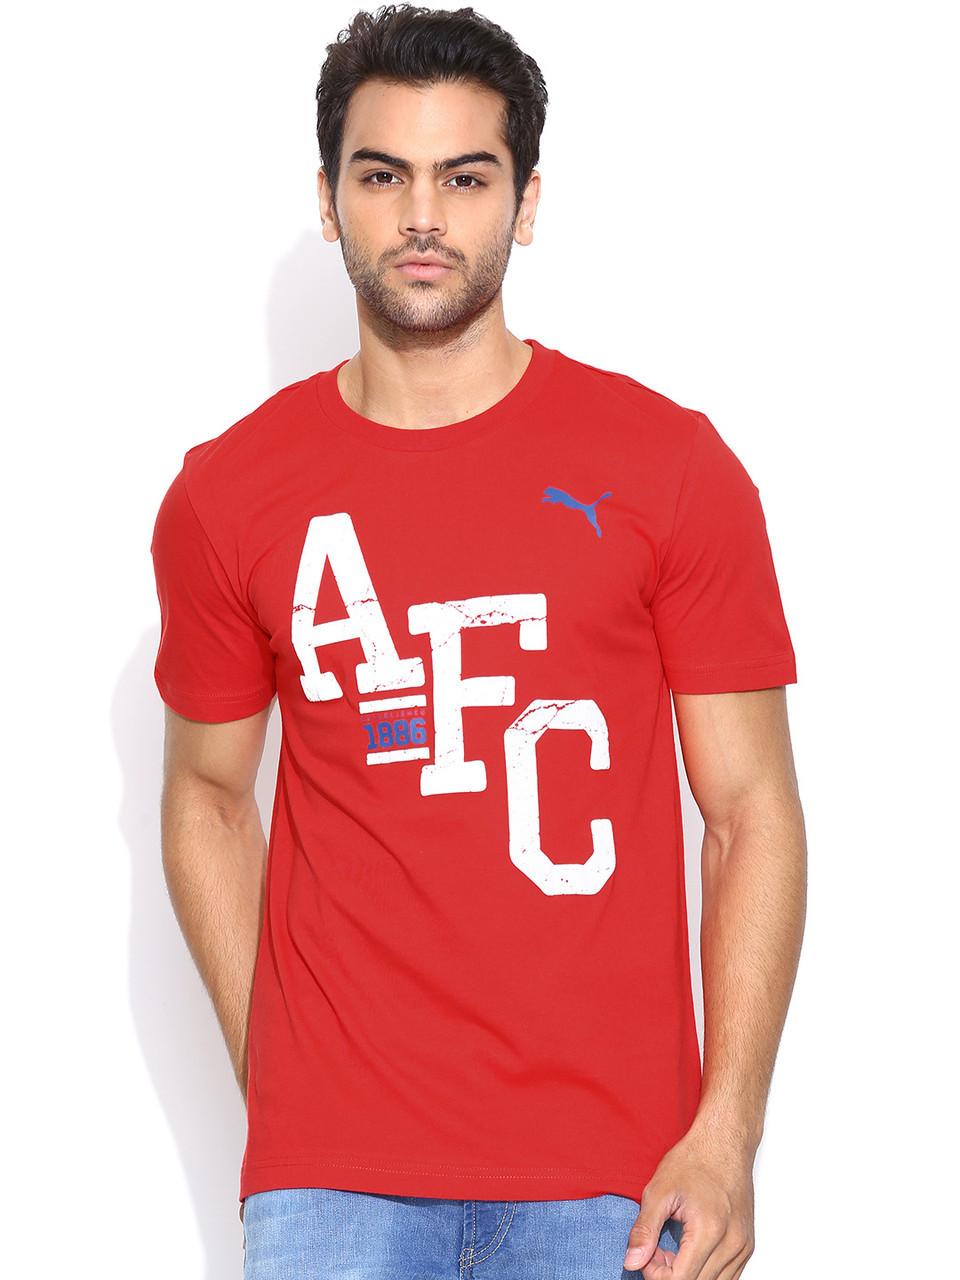 Футболка мужская стильная PUMA AFC FAN